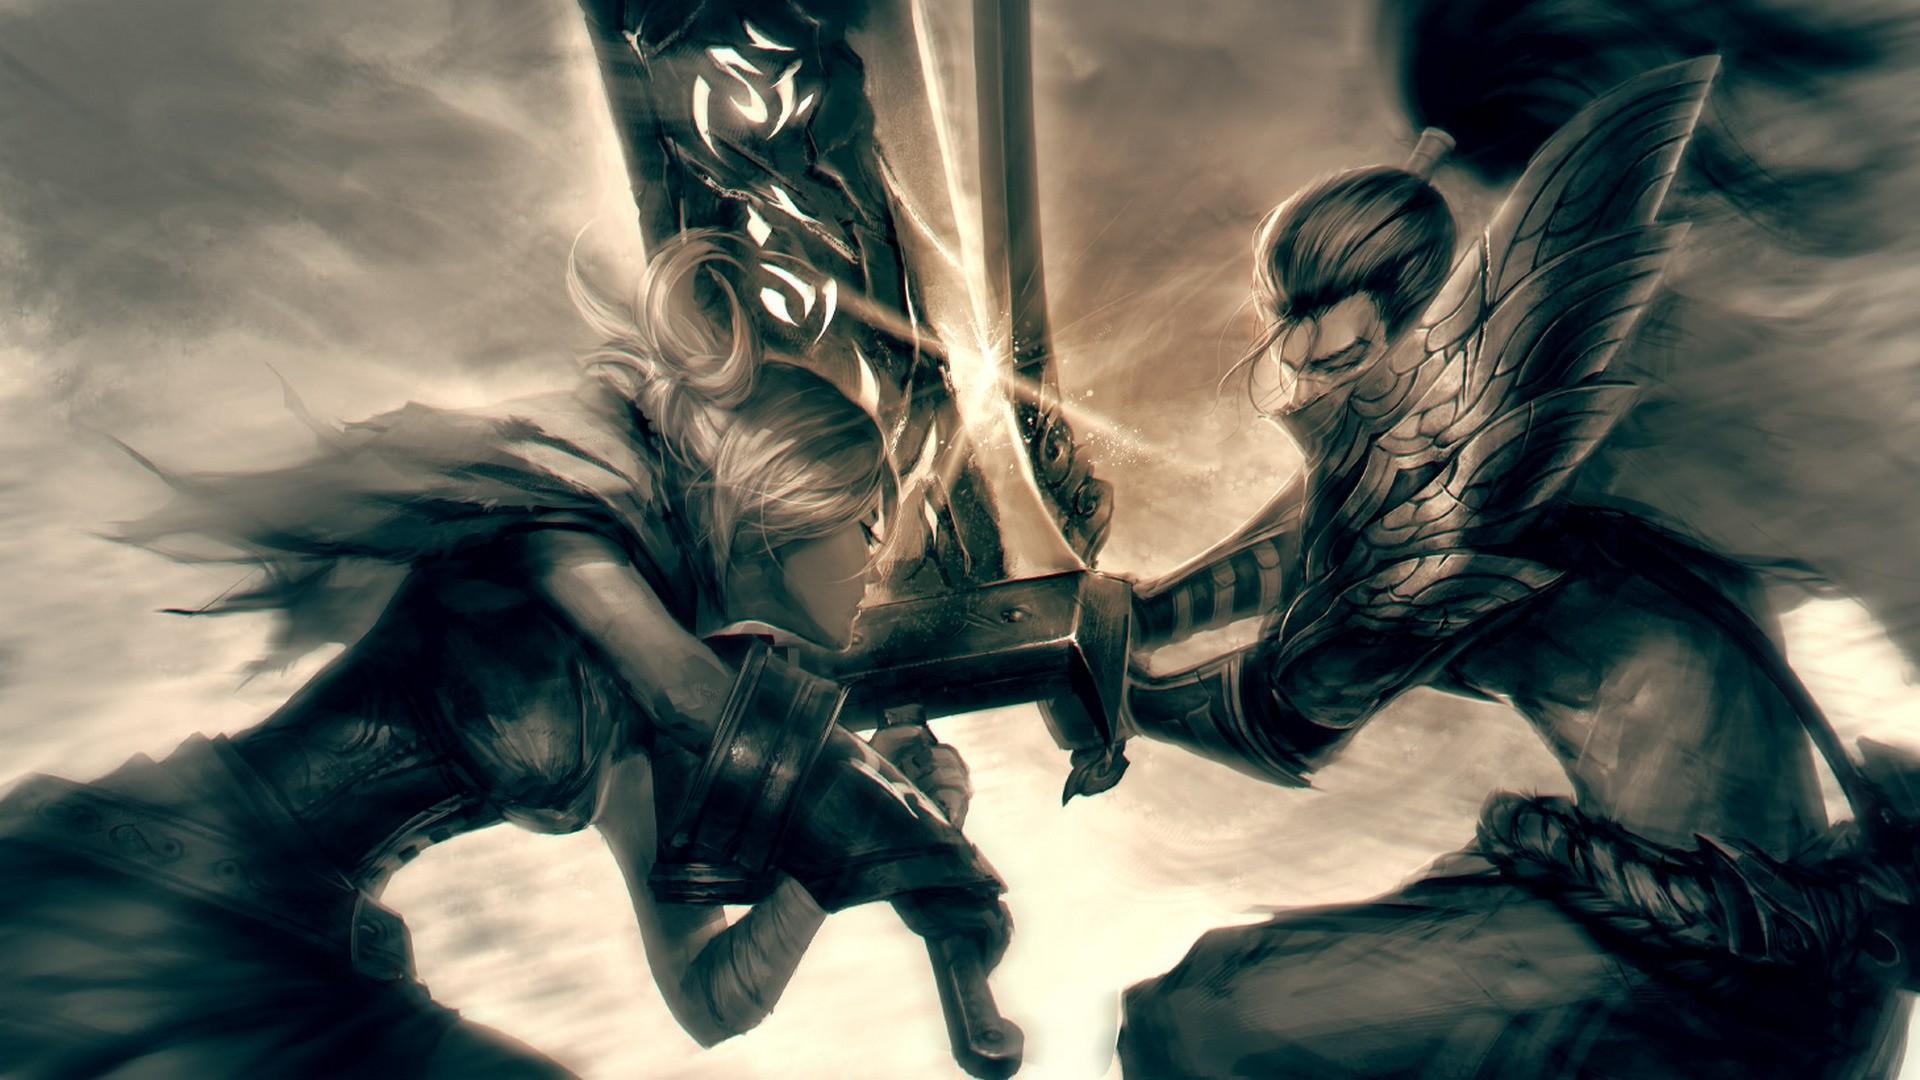 Video Games Fantasy Art Anime Battle League Of Legends Artwork Sword Riven Mythology Fictional Yasuo